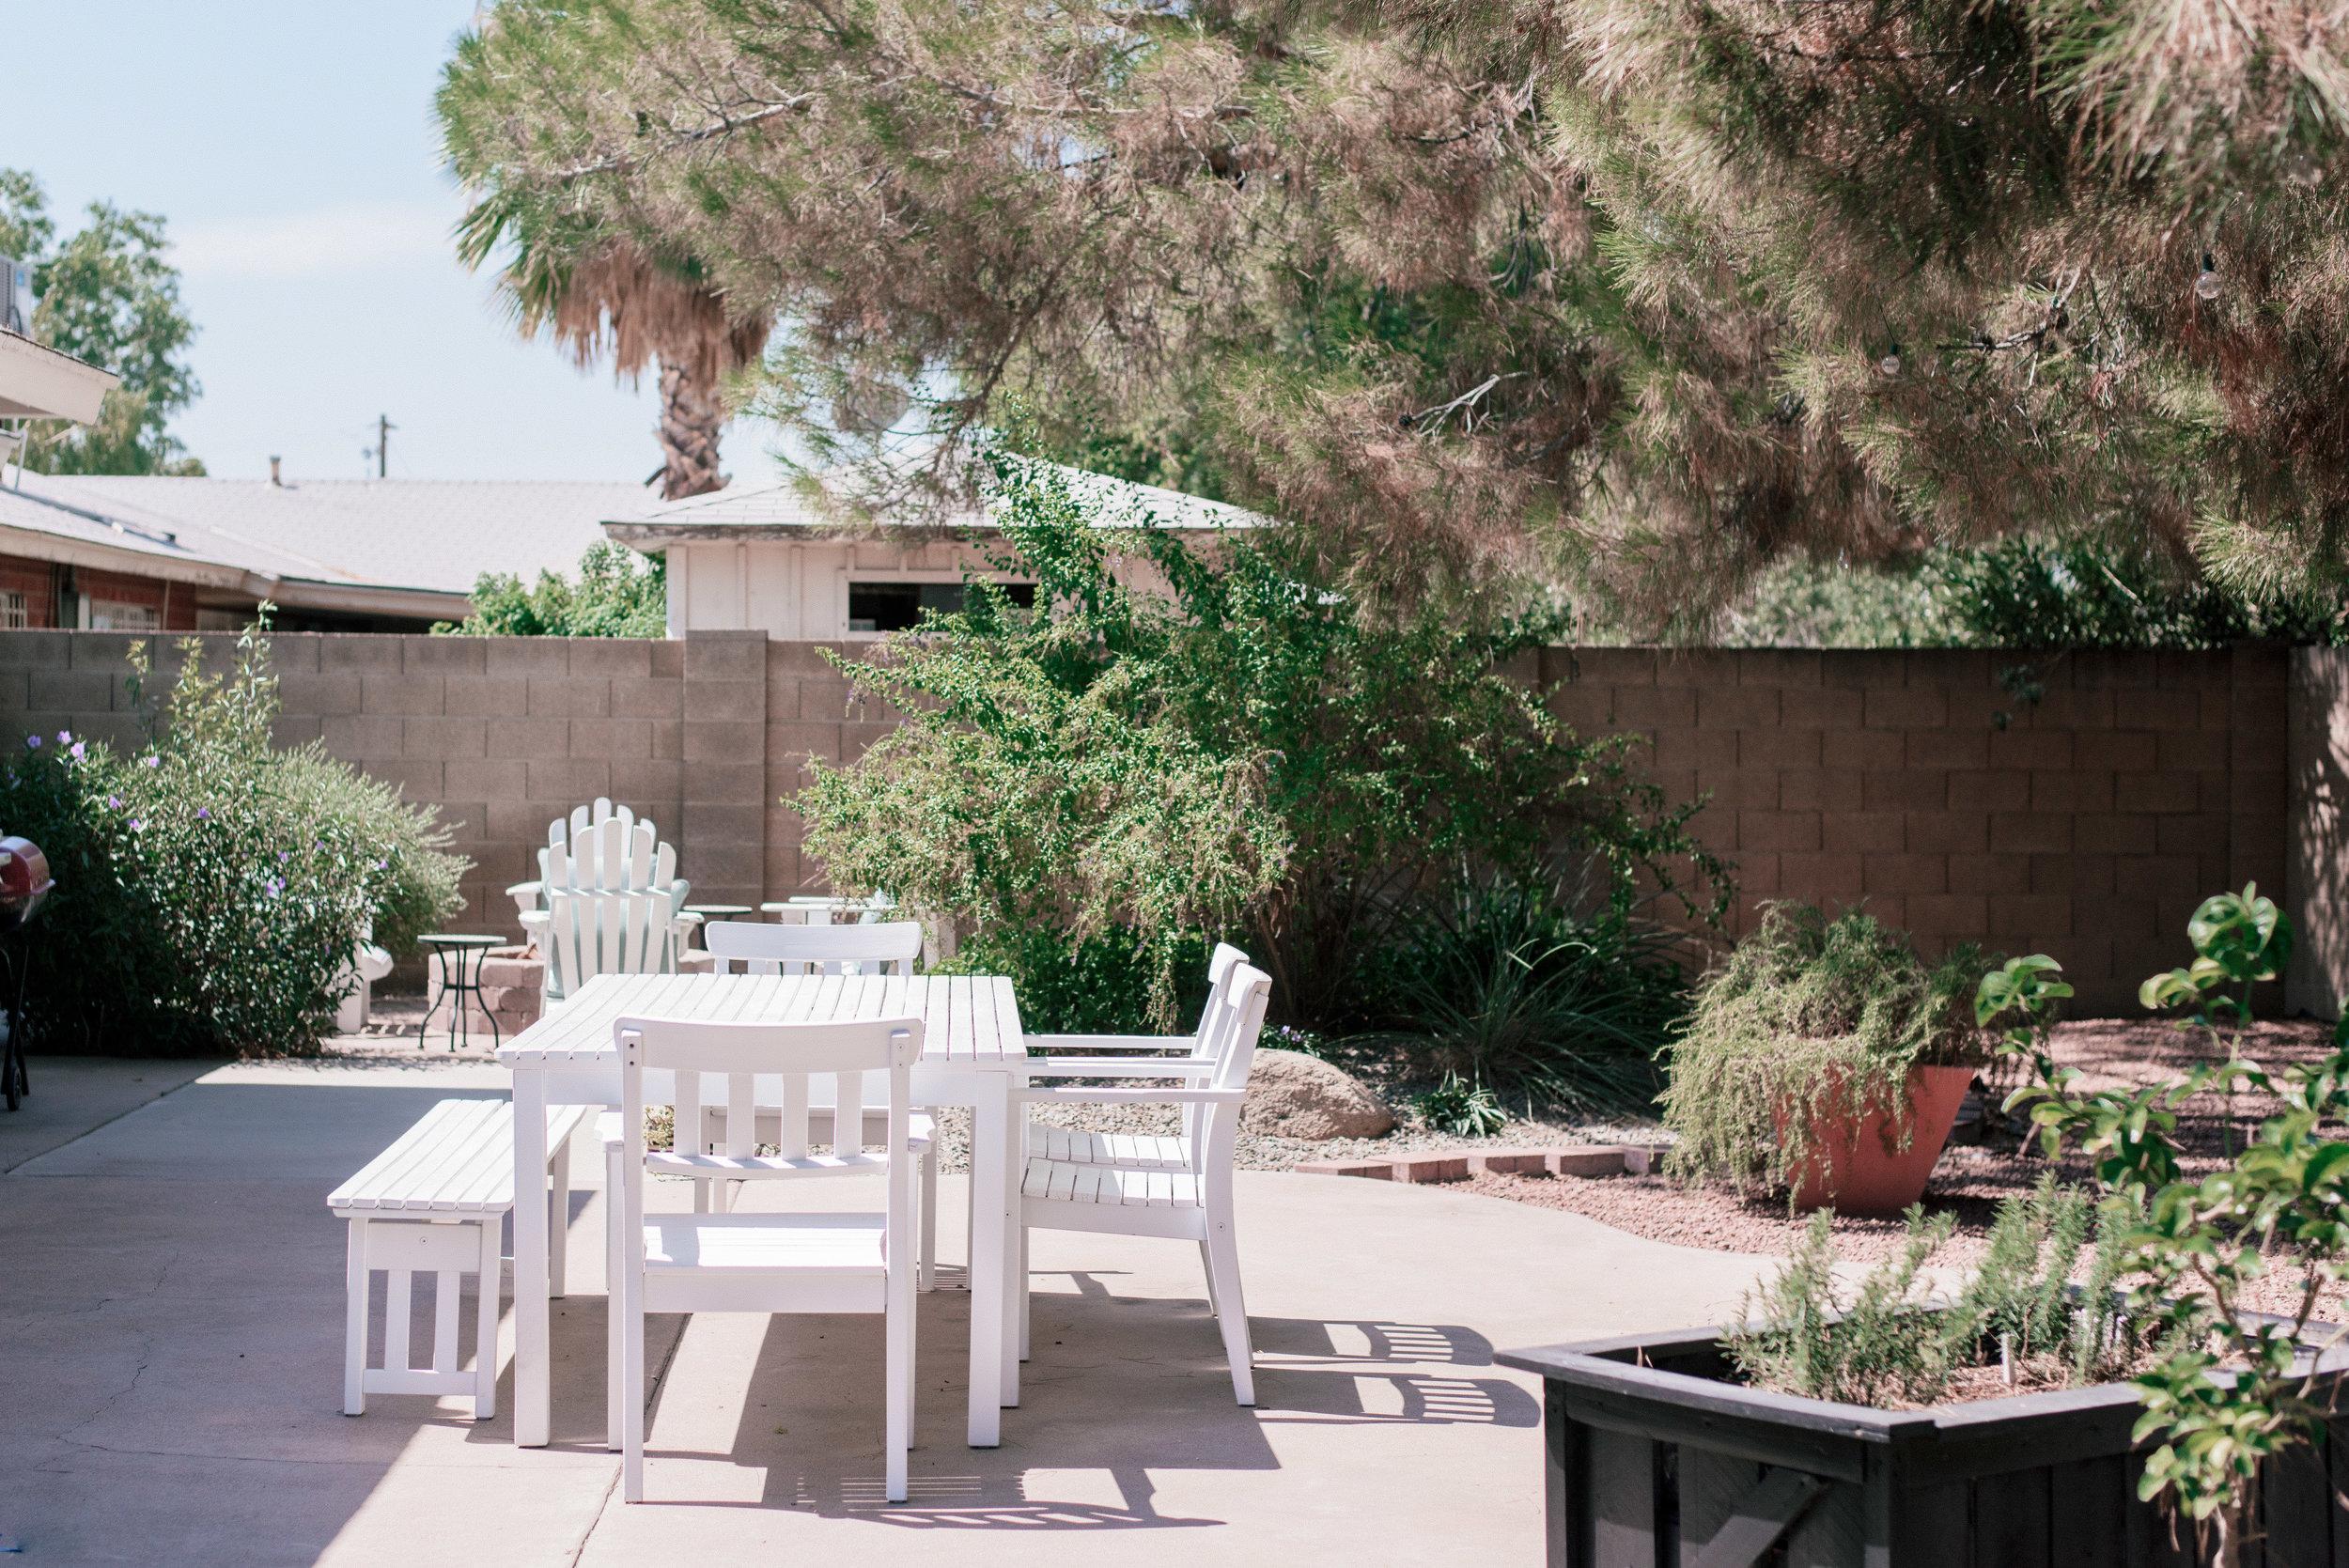 backyard-patio-pergola-plans-3.jpg